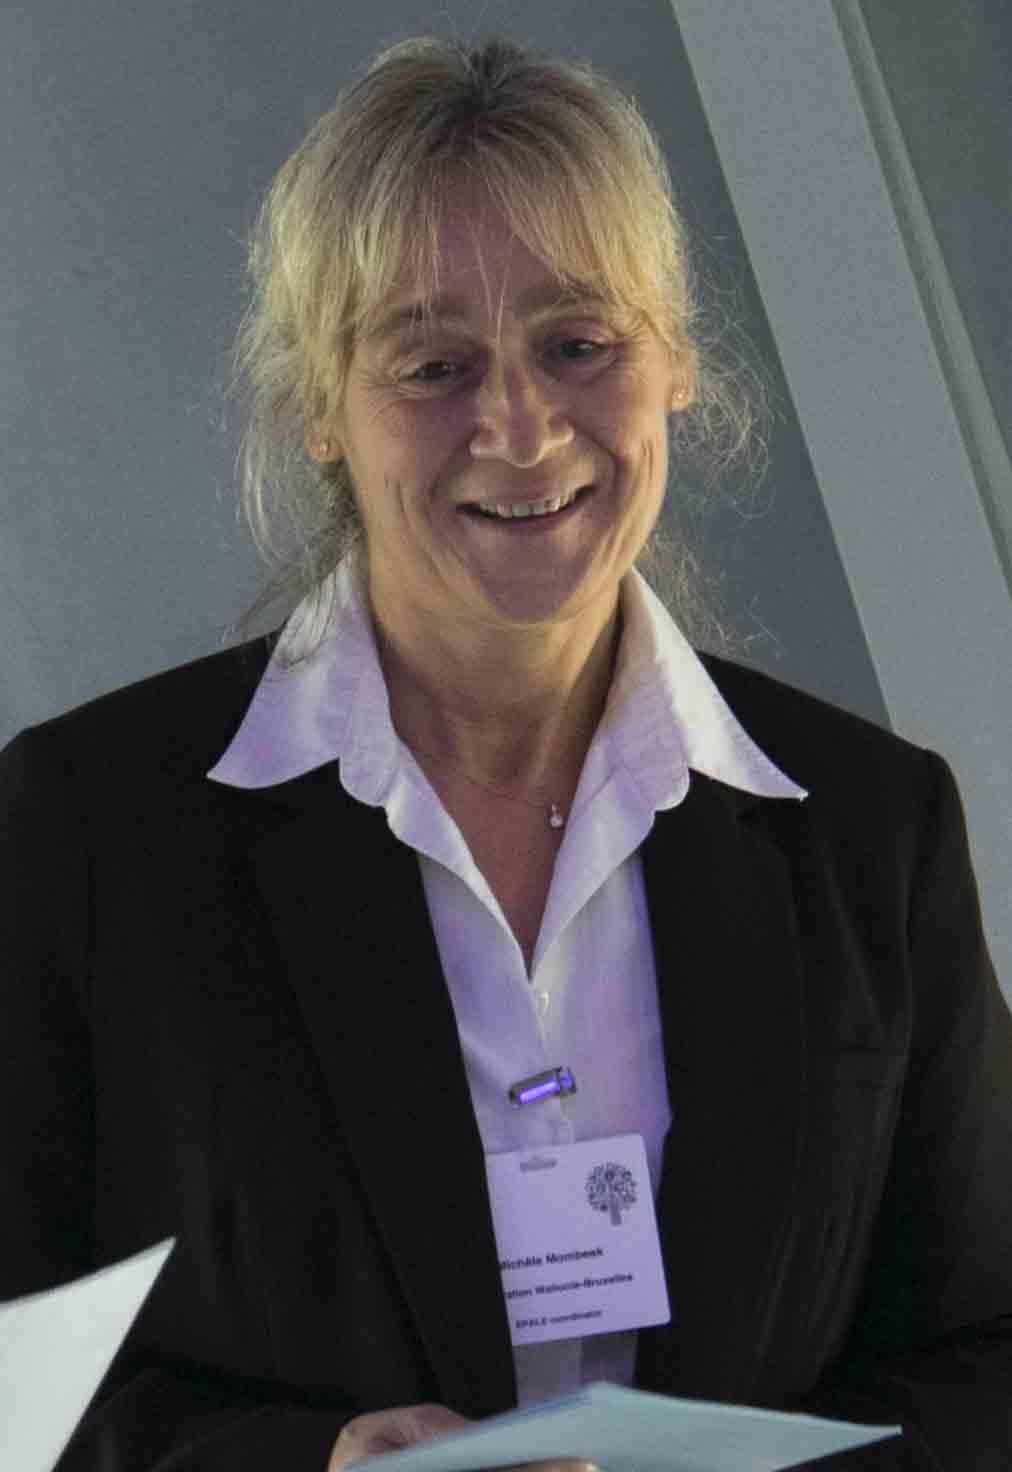 Michèle Mombeek